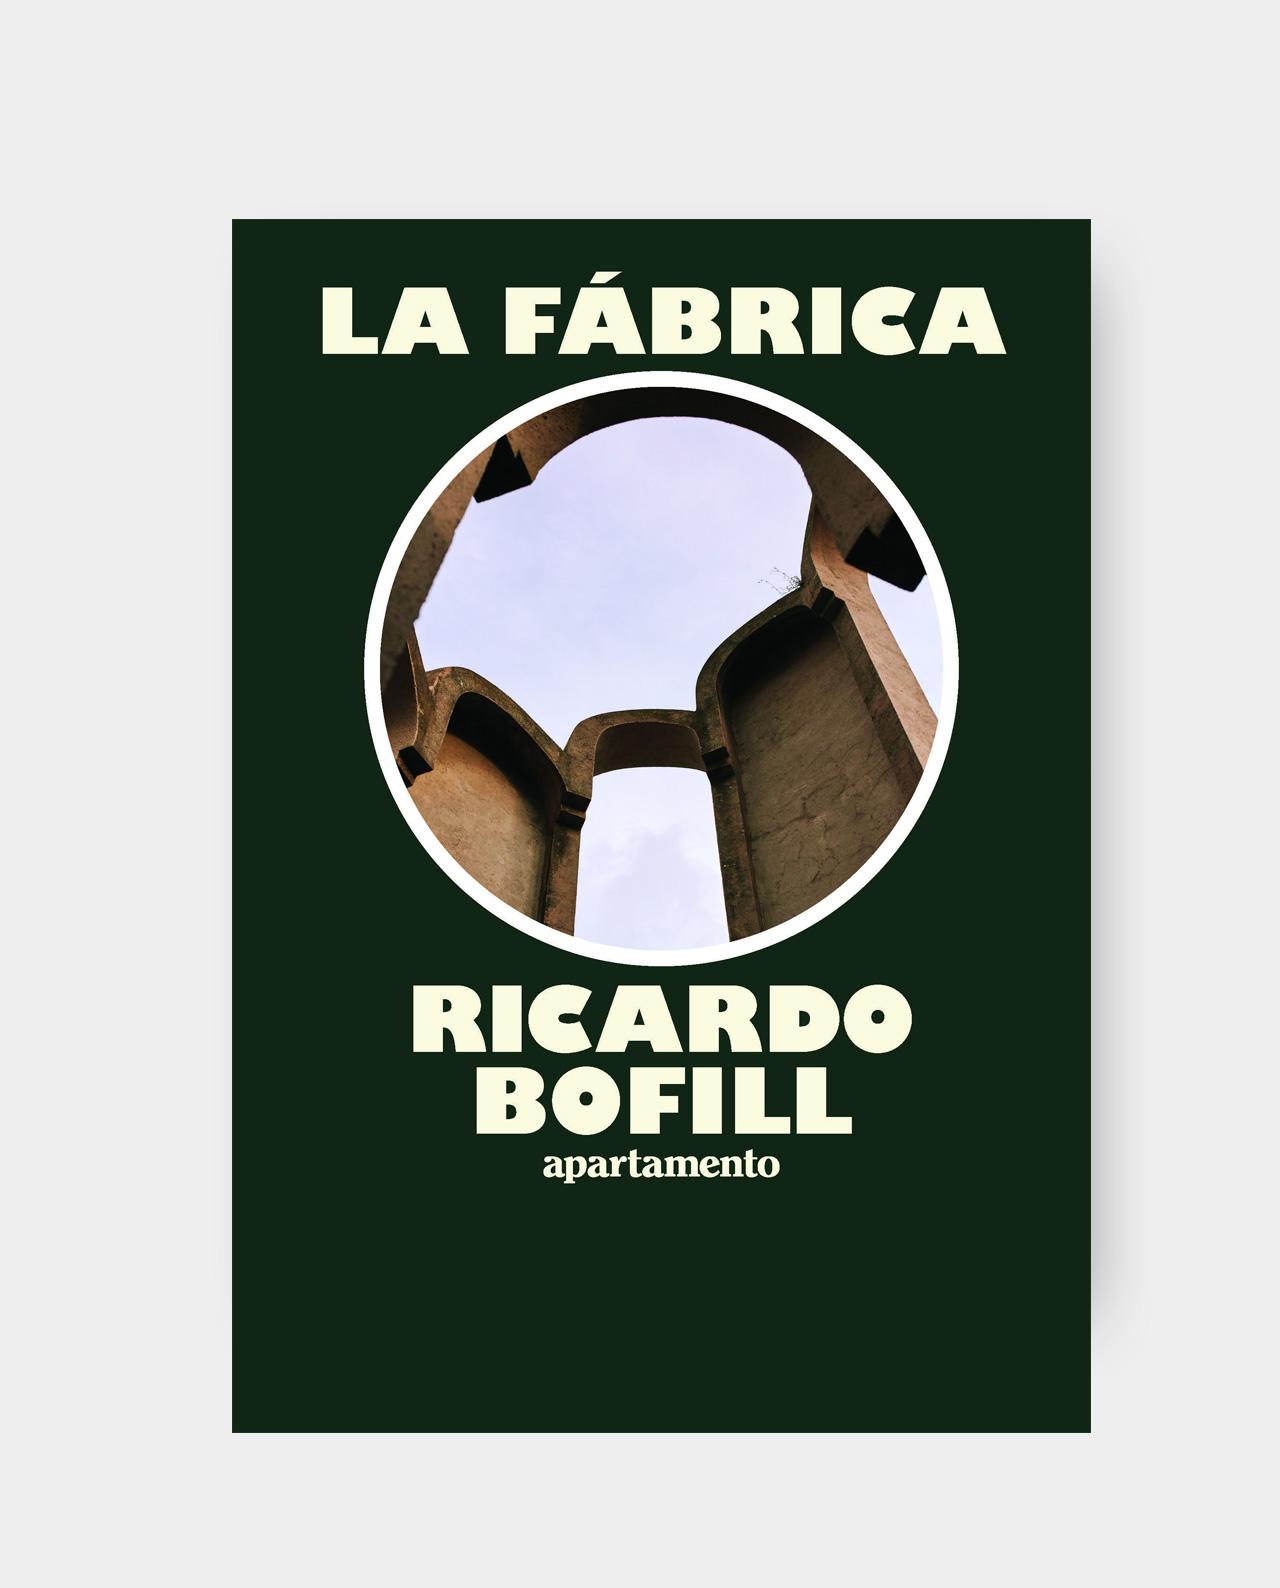 LA FÁBRICA: RICARDO BOFILL